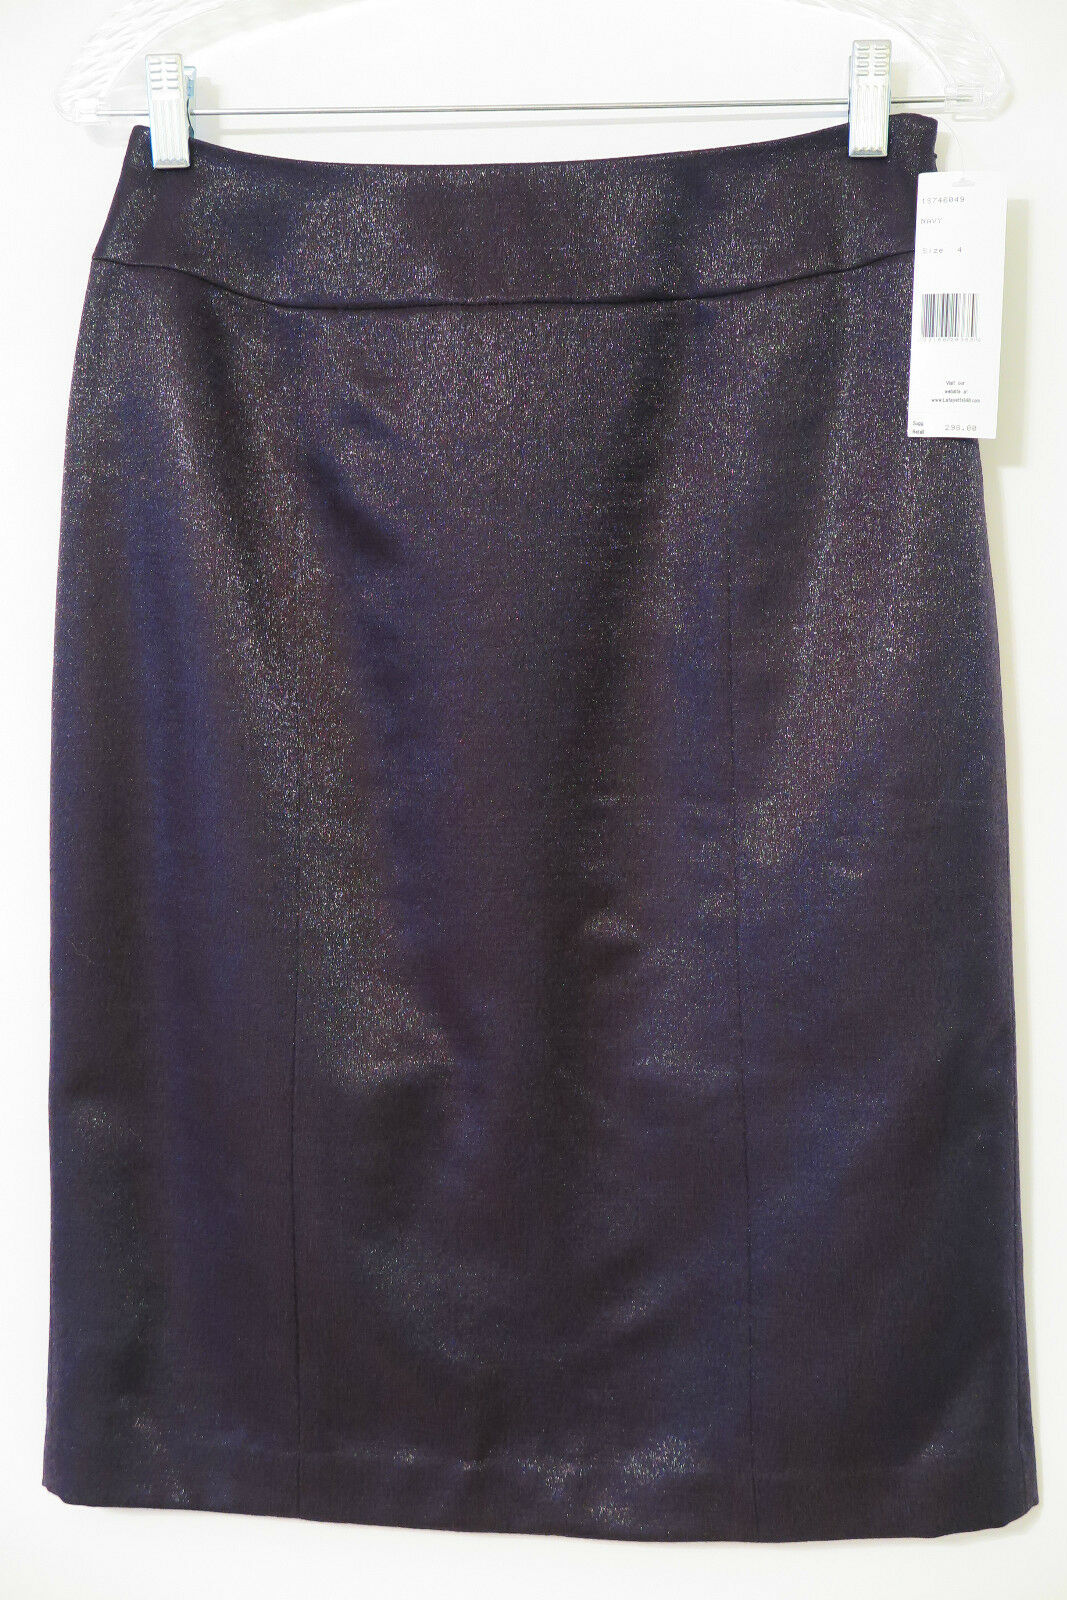 NWT Lafayette 148 Navy Shimmer Wool Blend Straight Skirt Size 4 MSRP  298